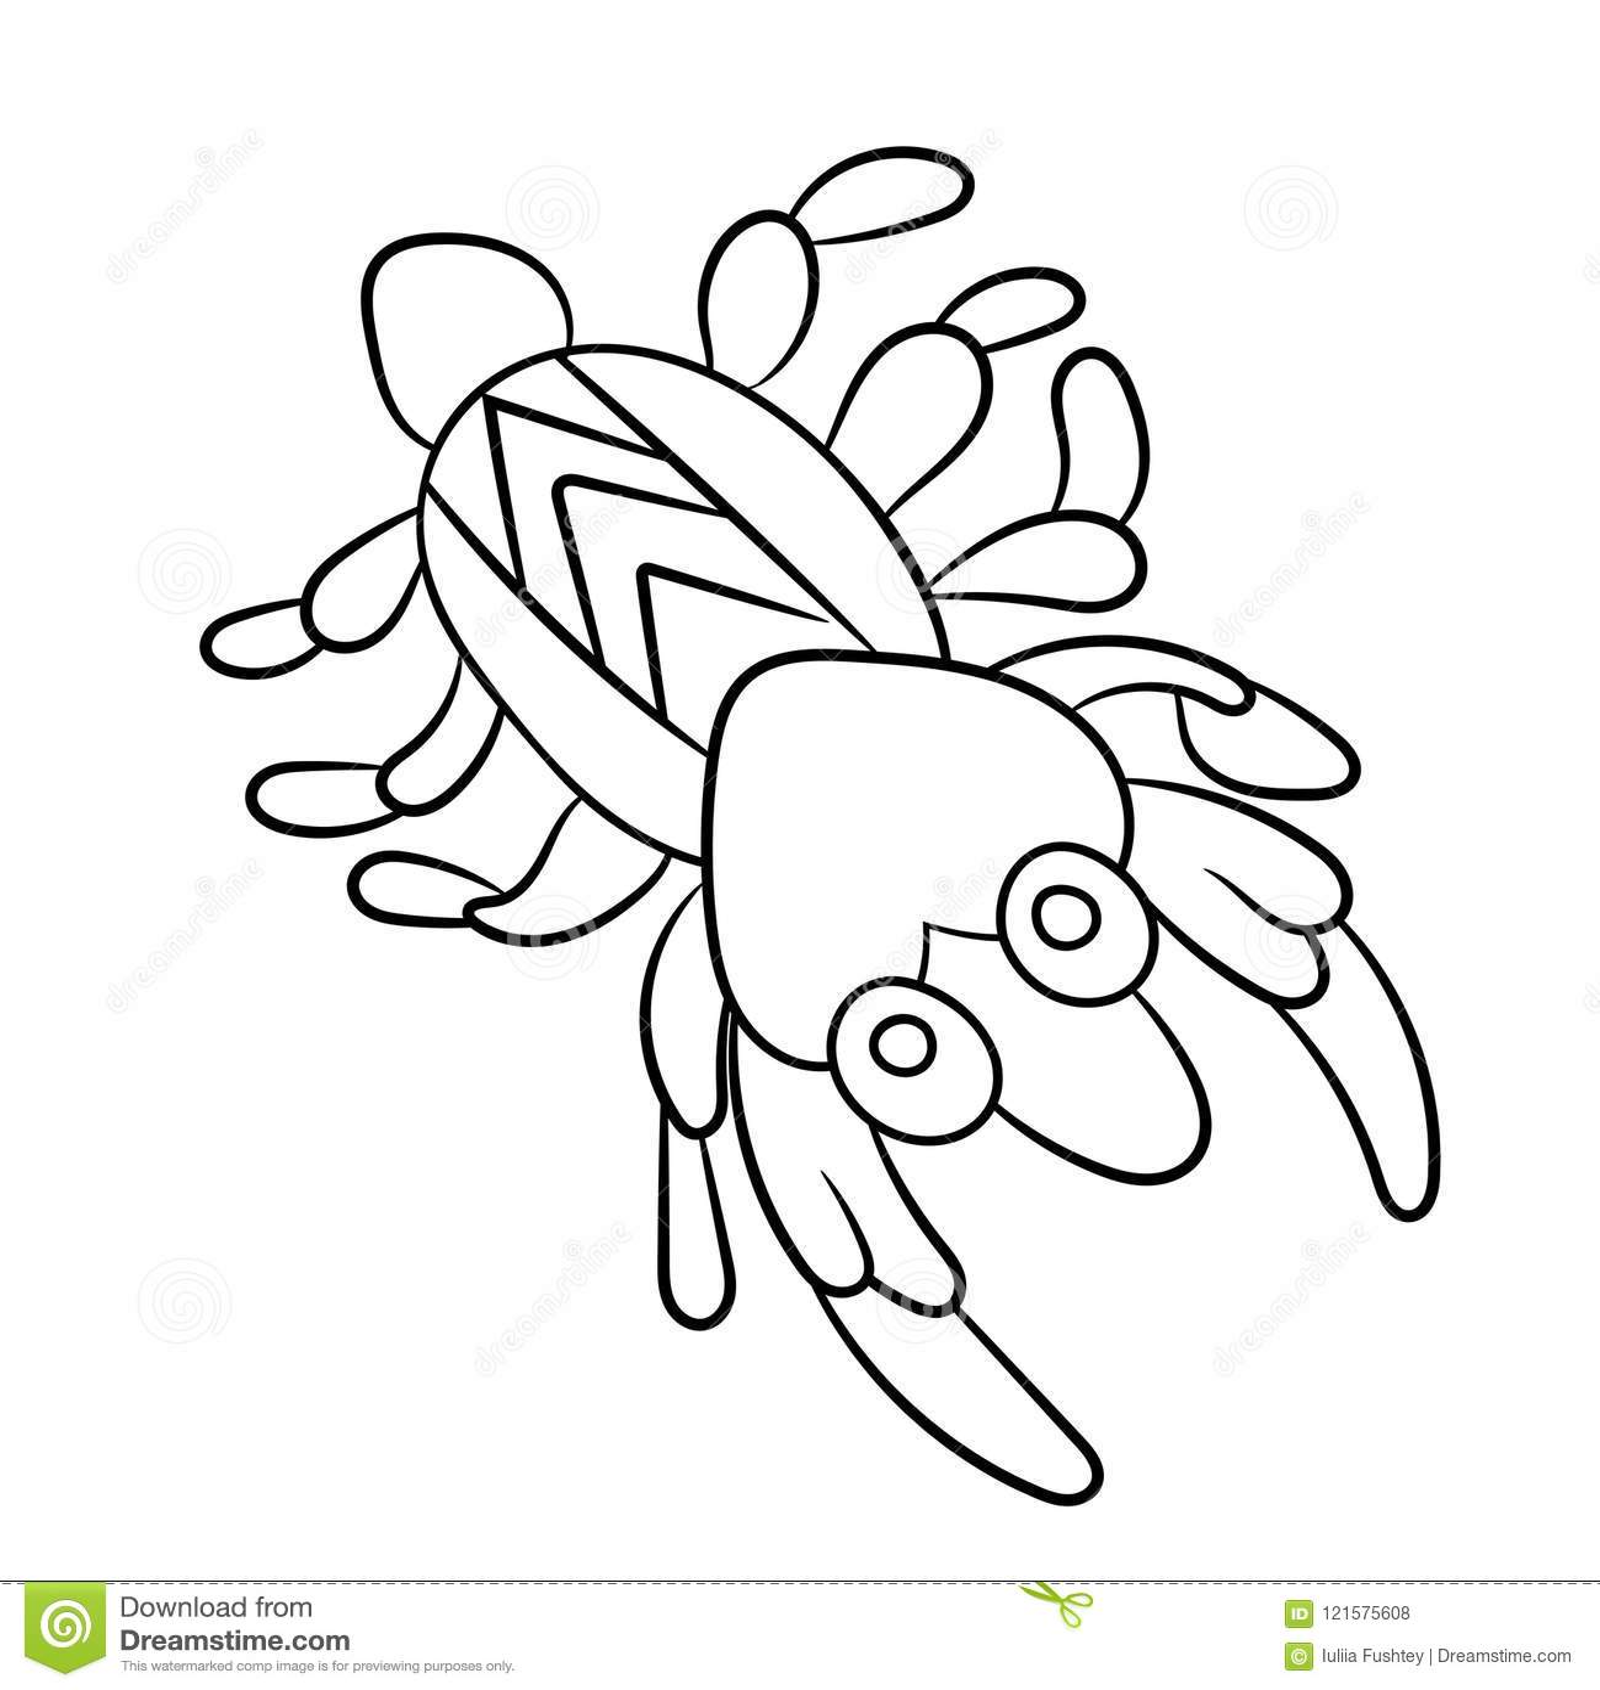 Shrimp Coloring Book Small Marine Cancroid Ocean